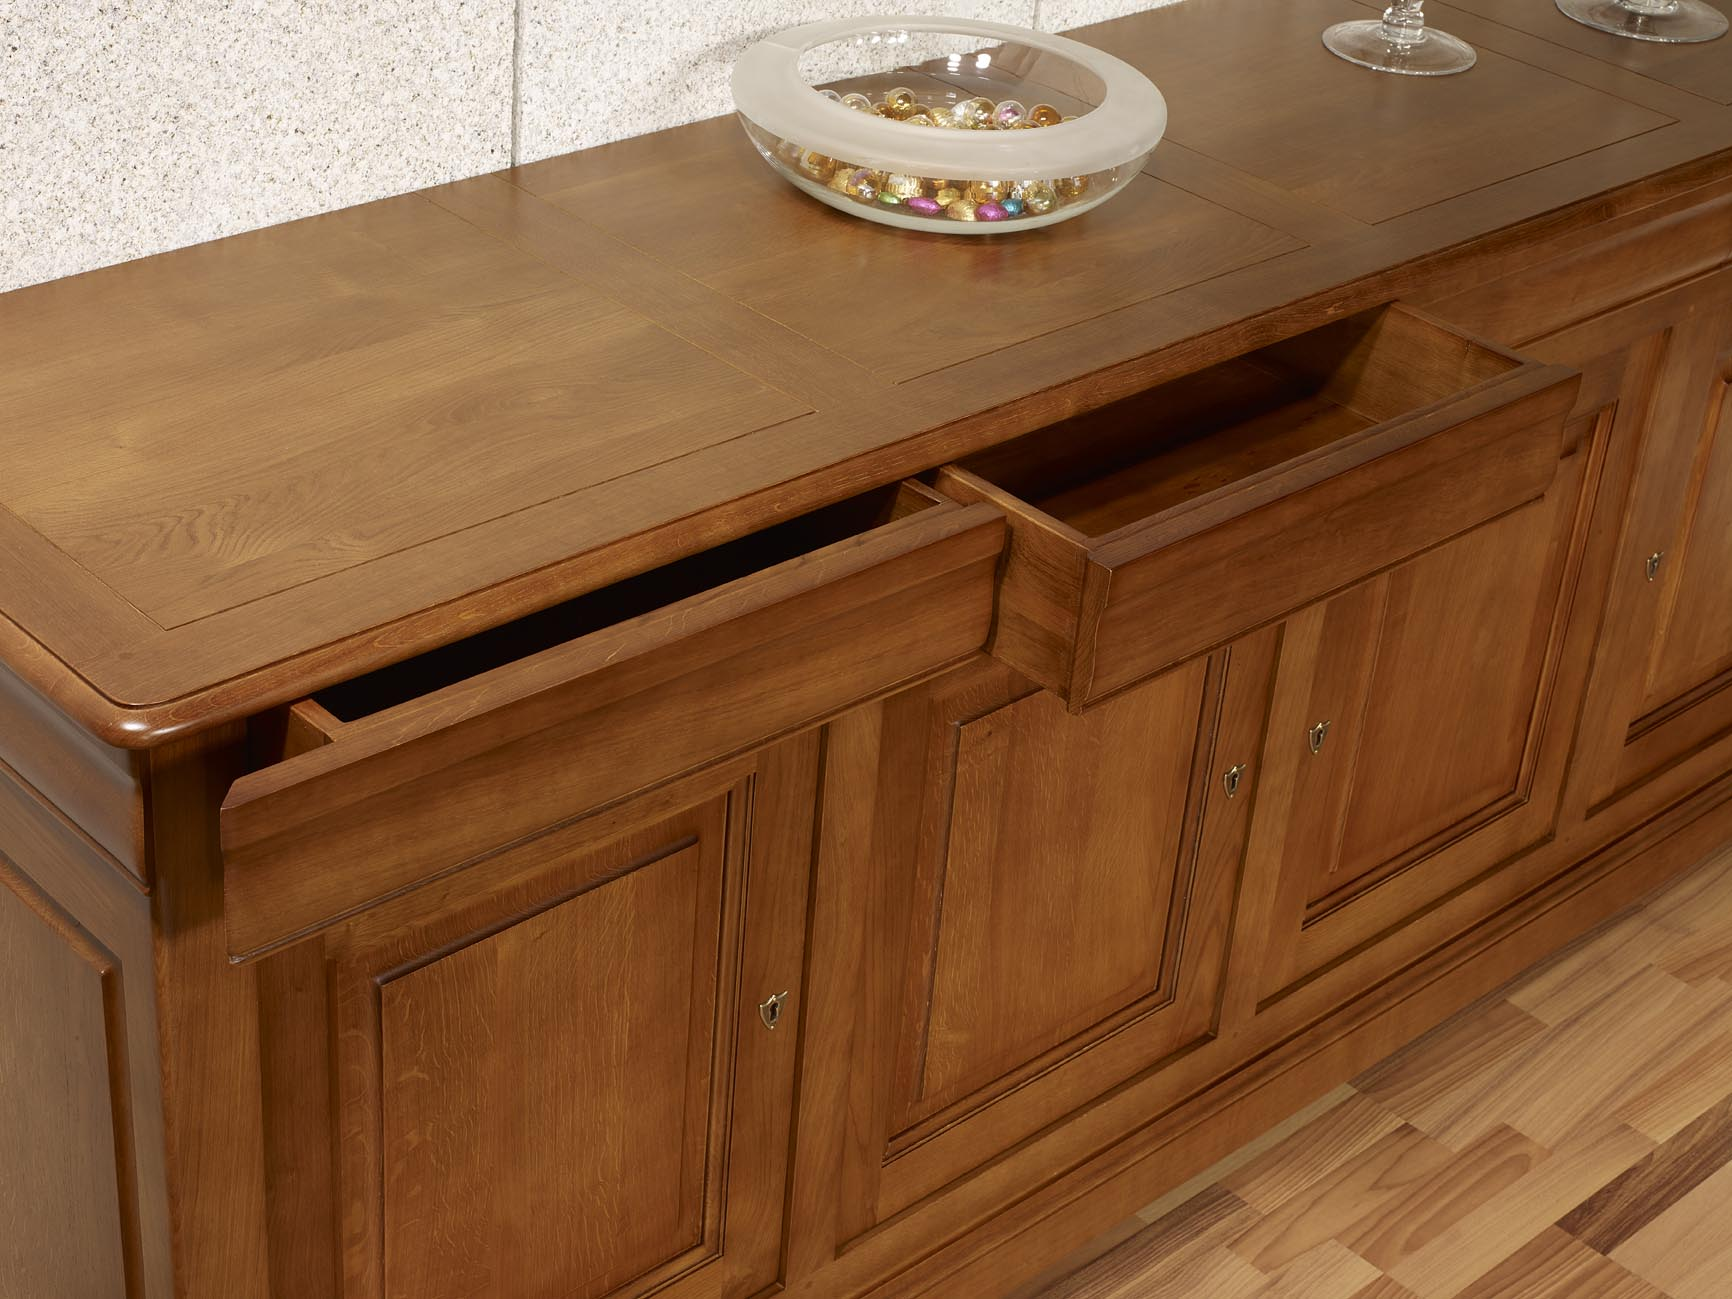 buffet 4 portes baptiste en ch ne massif de style louis philippe finition ch ne moyen patin. Black Bedroom Furniture Sets. Home Design Ideas